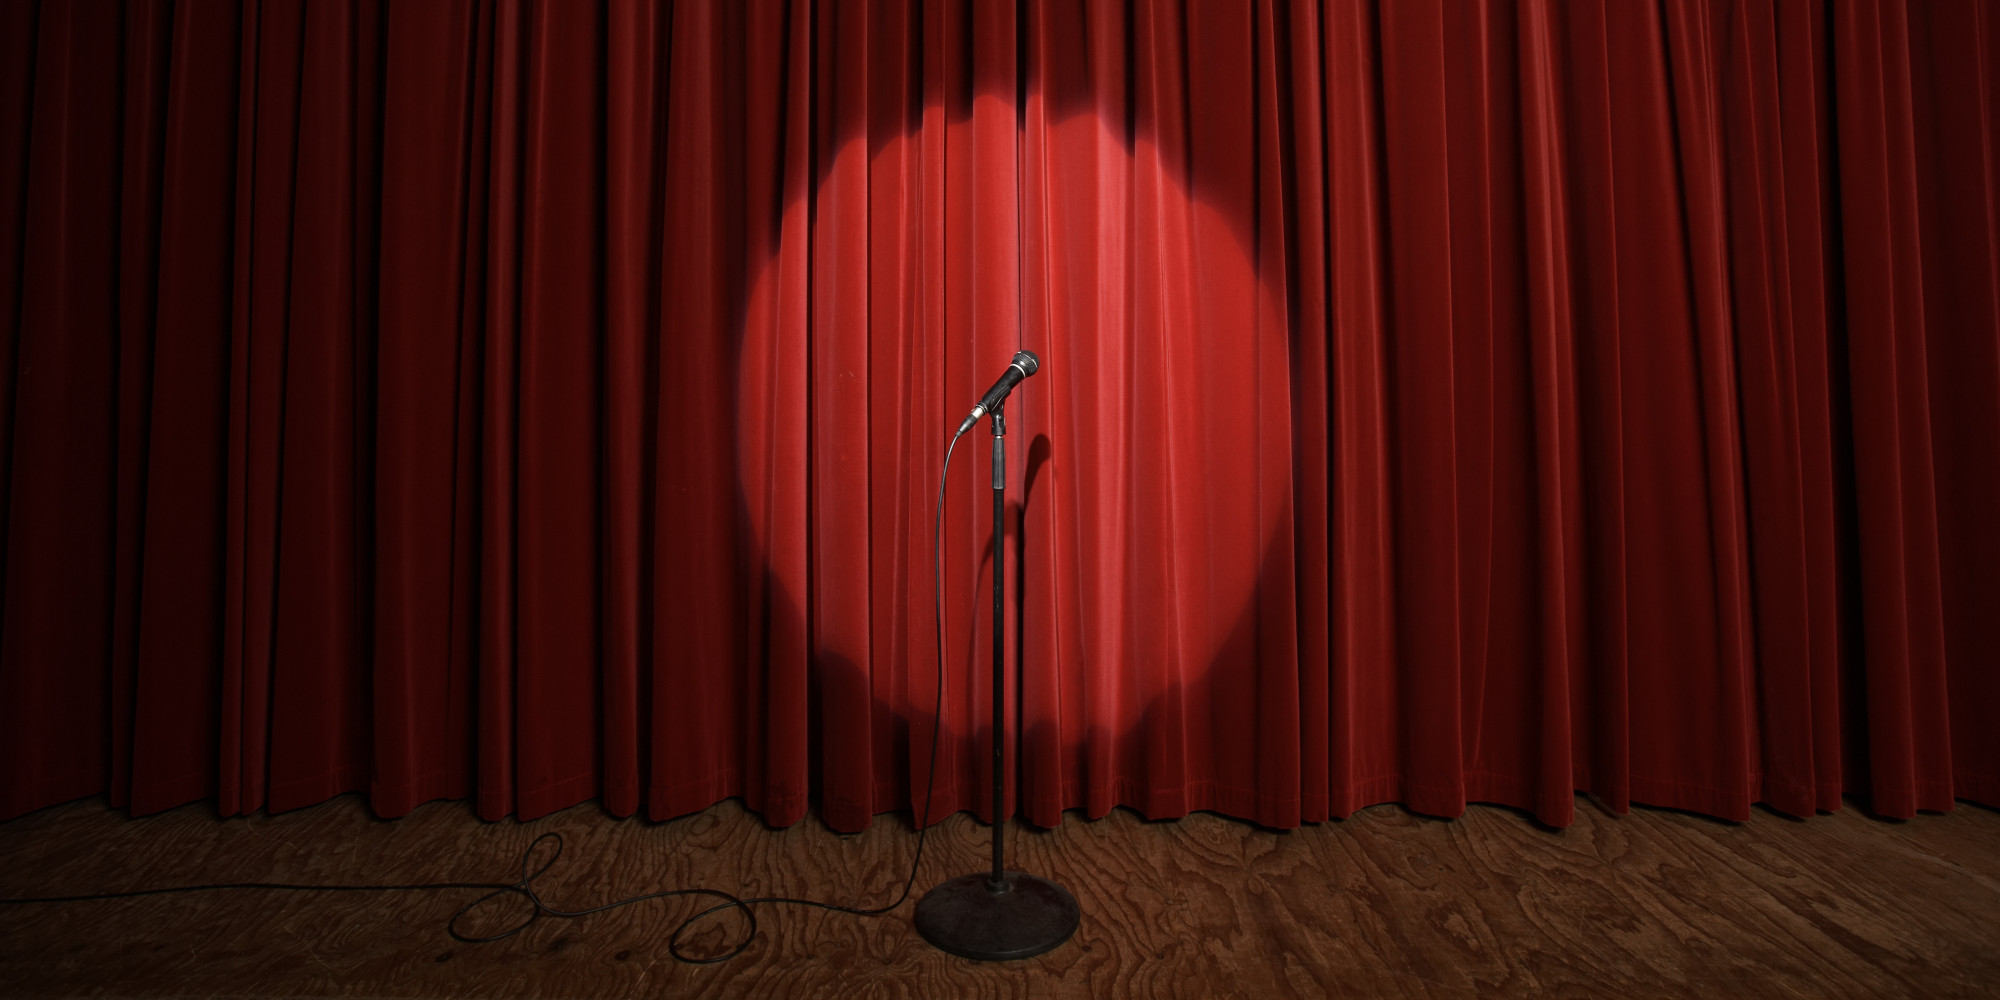 635964424989593960-1907228886_o-stage-microphone-facebook.jpg